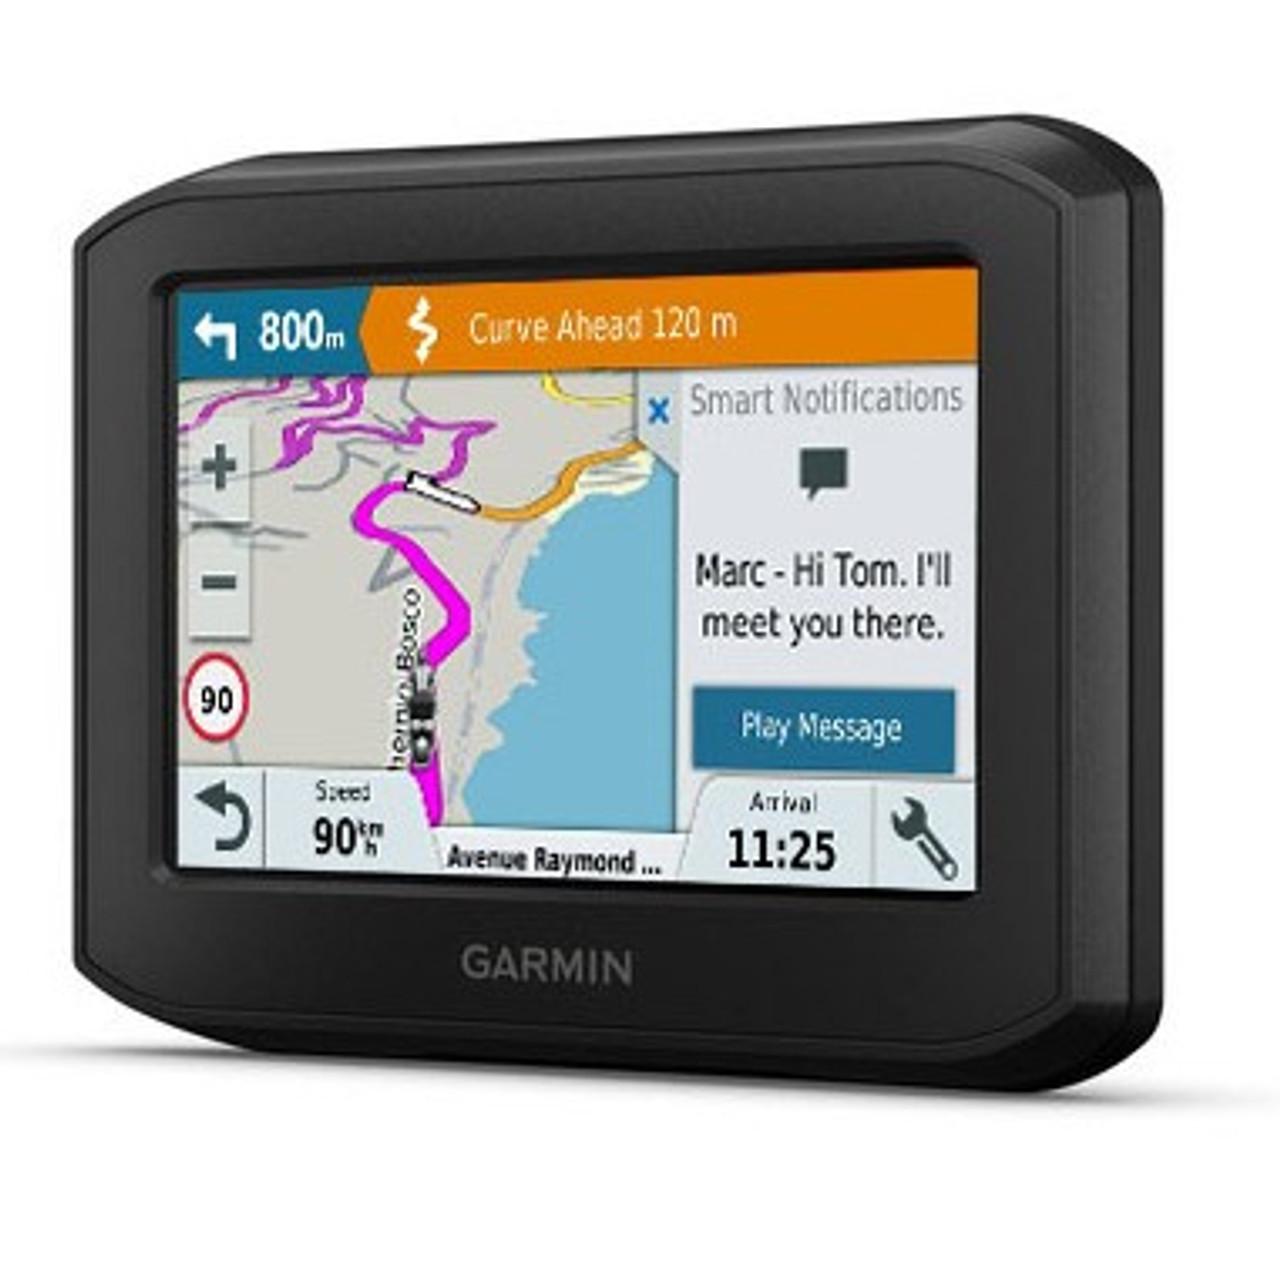 d8fd24eace7 GARMIN Zumo 346LM Europe Maps Motorcycle Sat-Nav GPS for Sale   Flitwick  Motorcycles